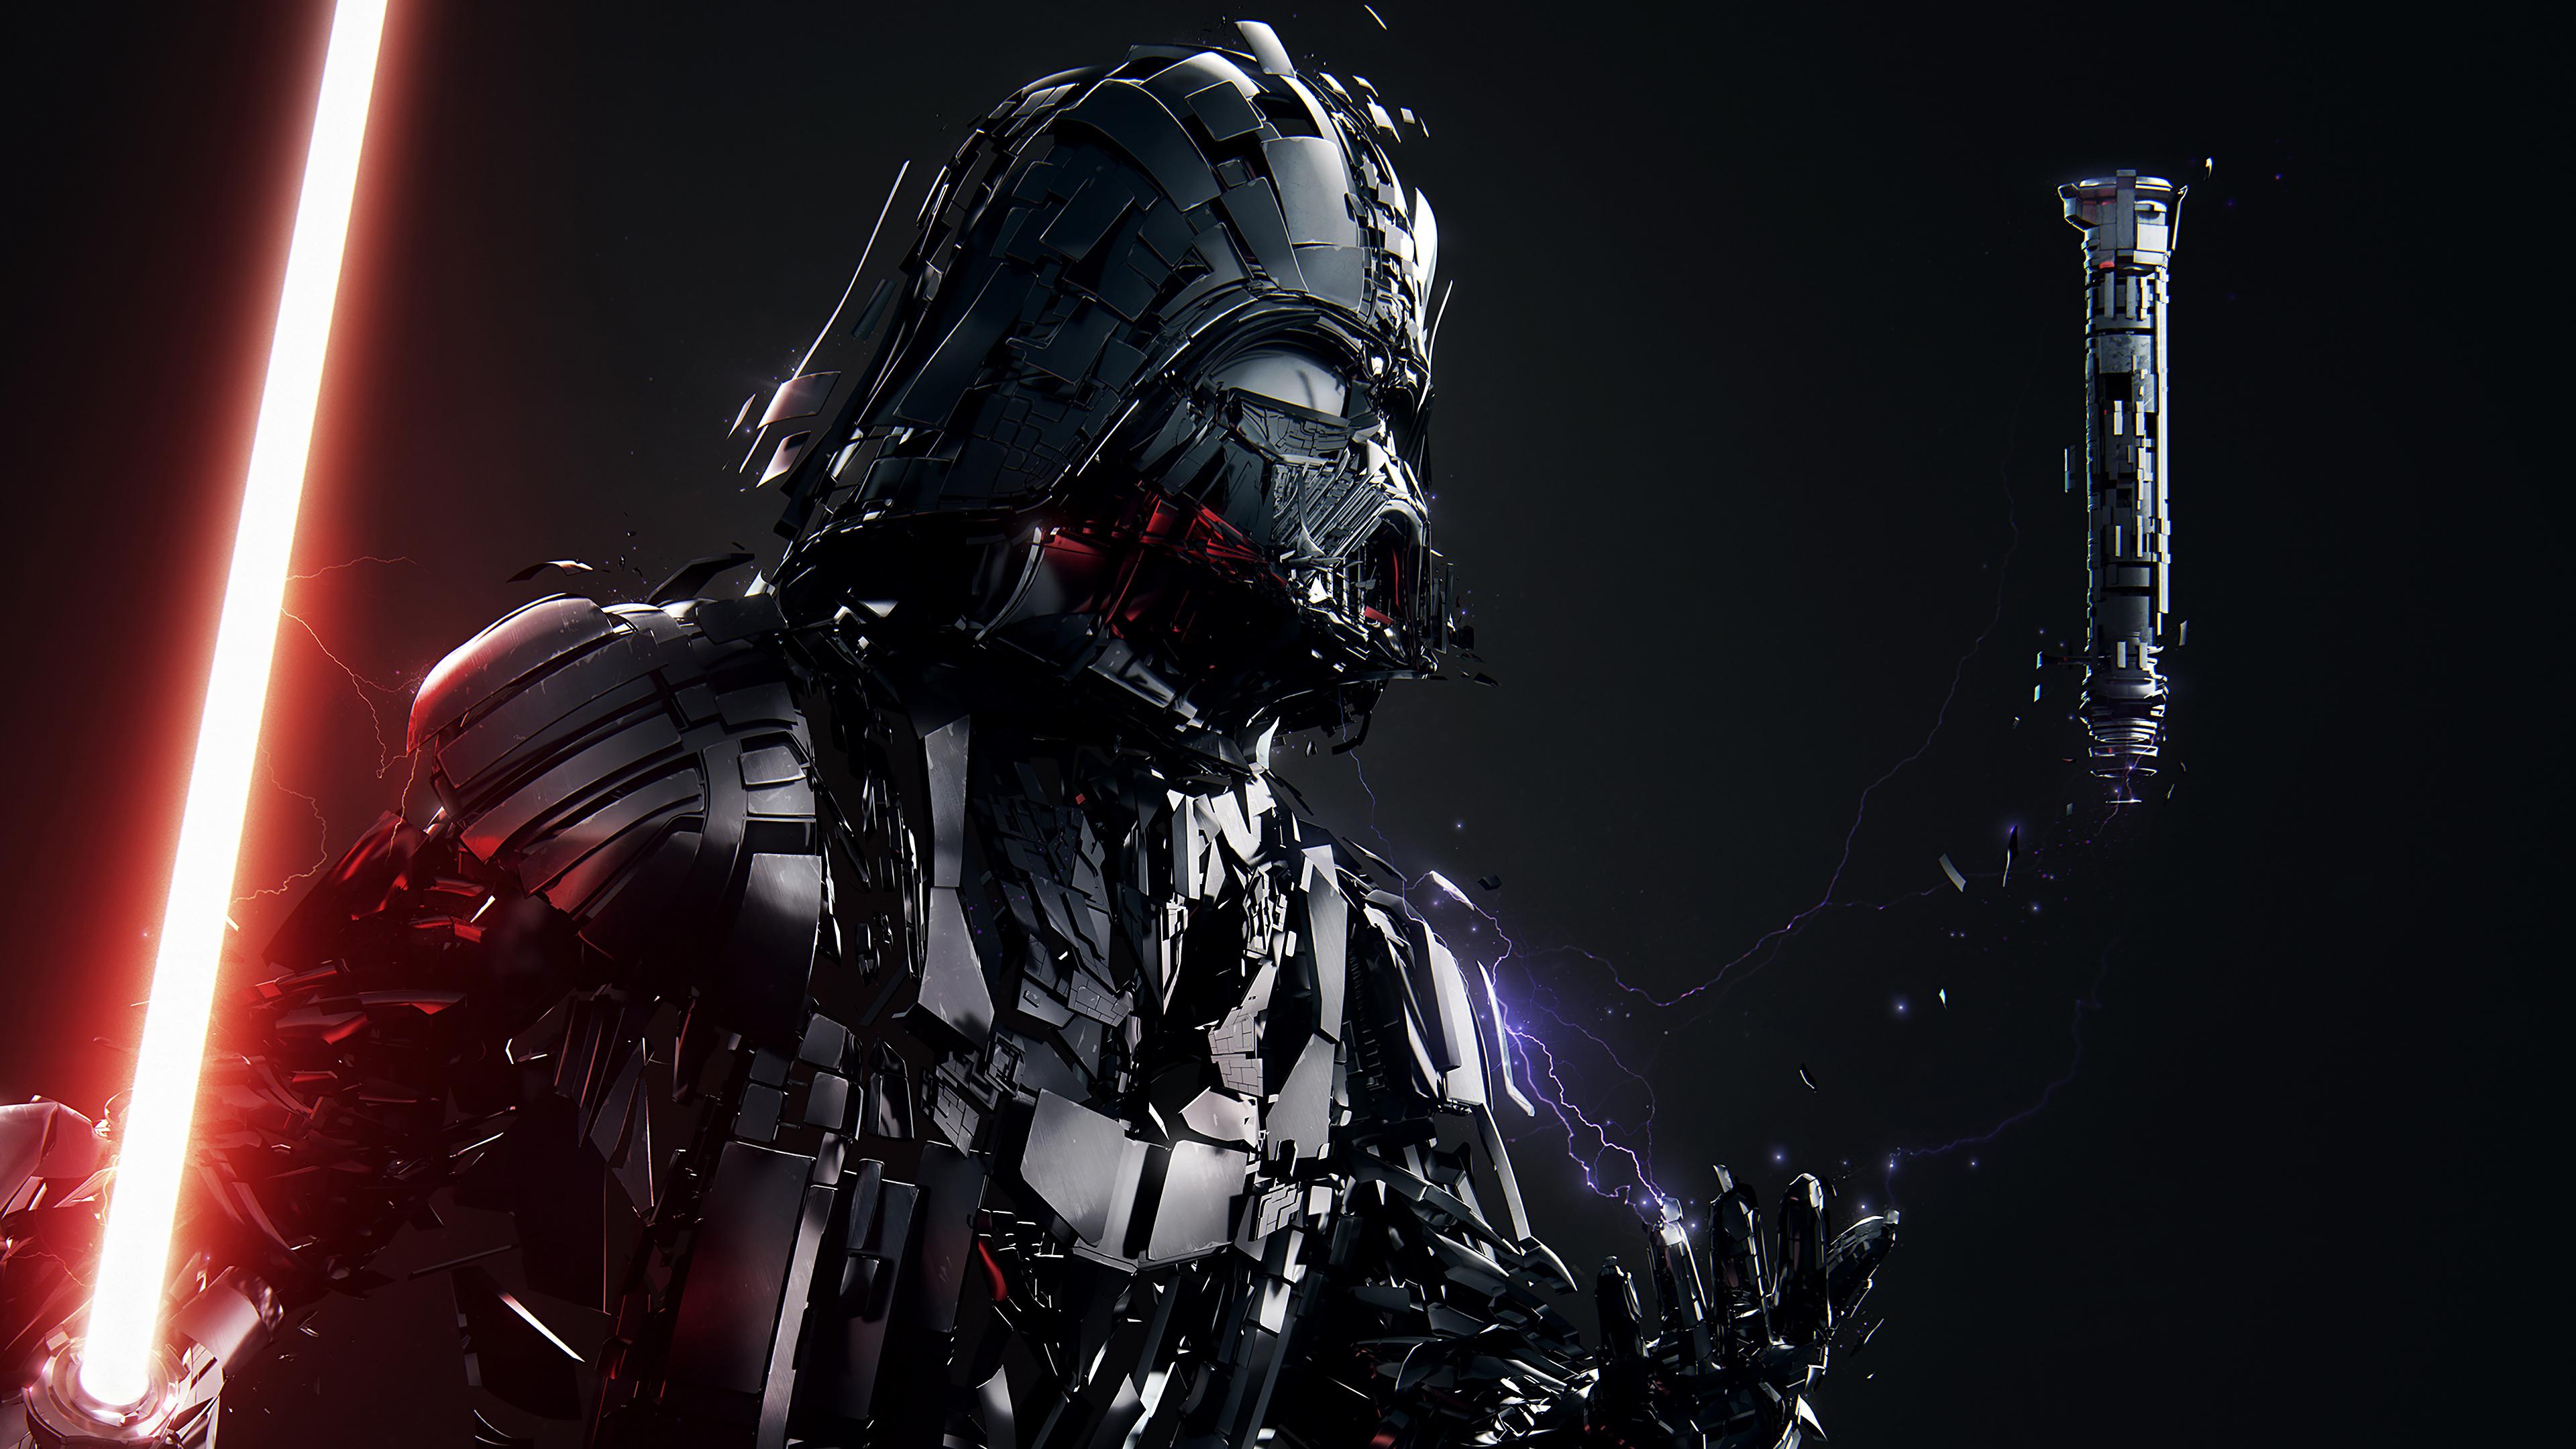 Darth Vader 3840x2160 Wallpaper Teahub Io